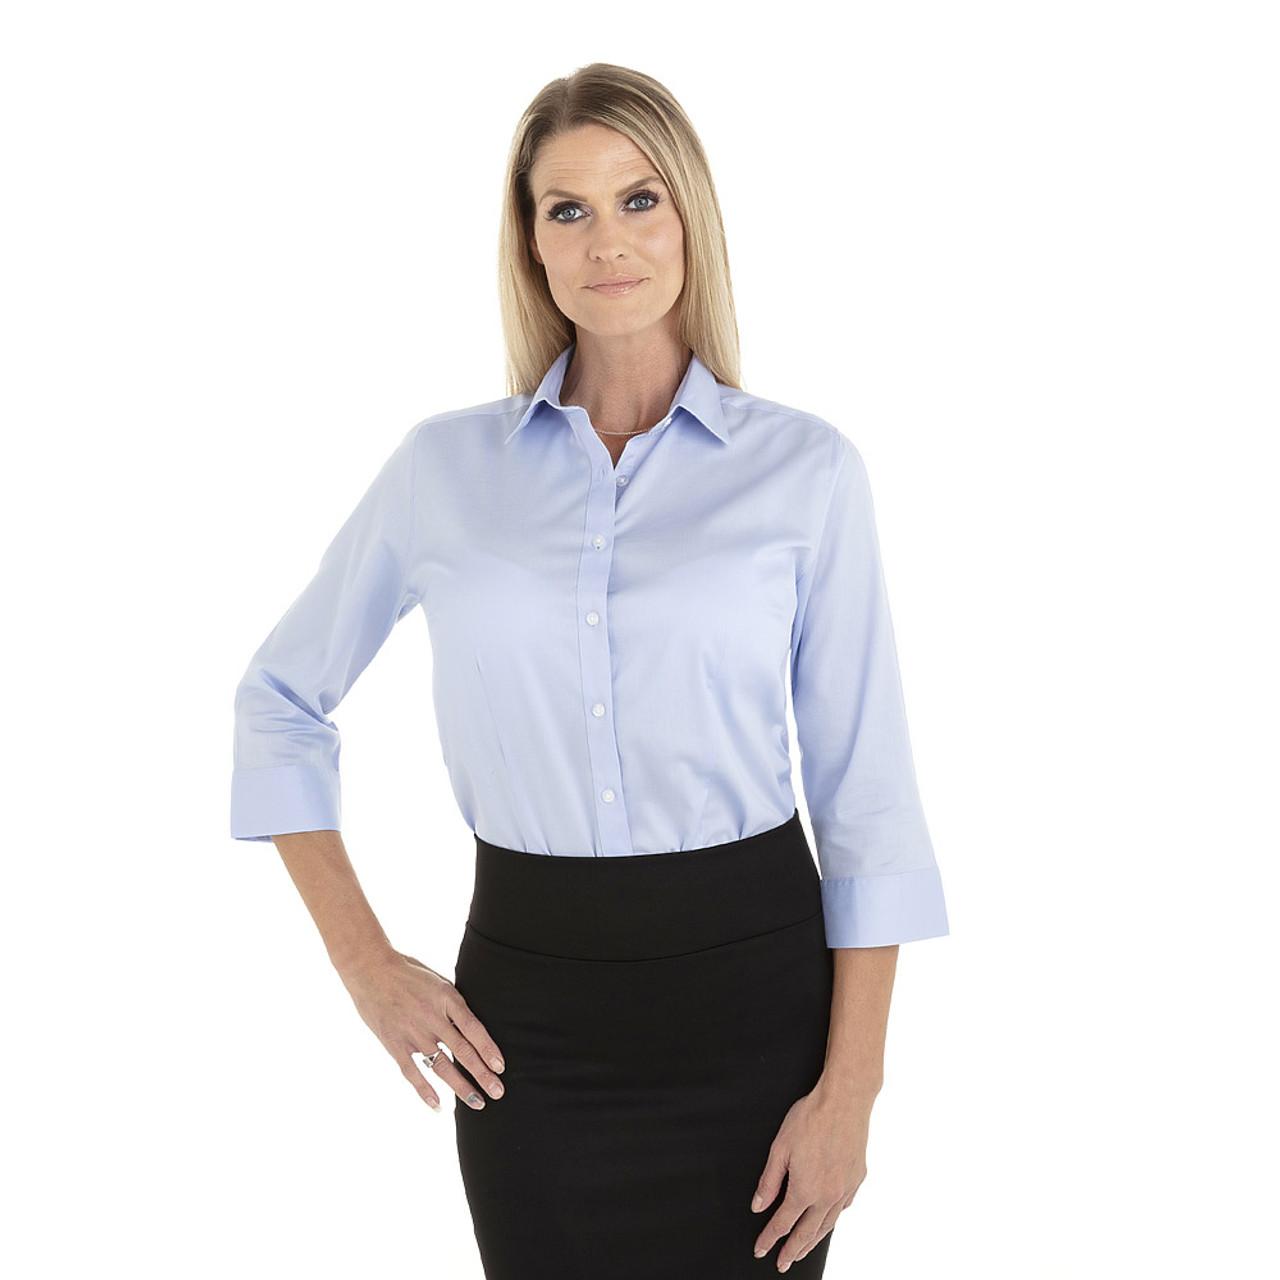 English Blue - 18CV304 Van Heusen Ladies' ¾ Sleeve Dress Twill Shirt | T-shirt.ca